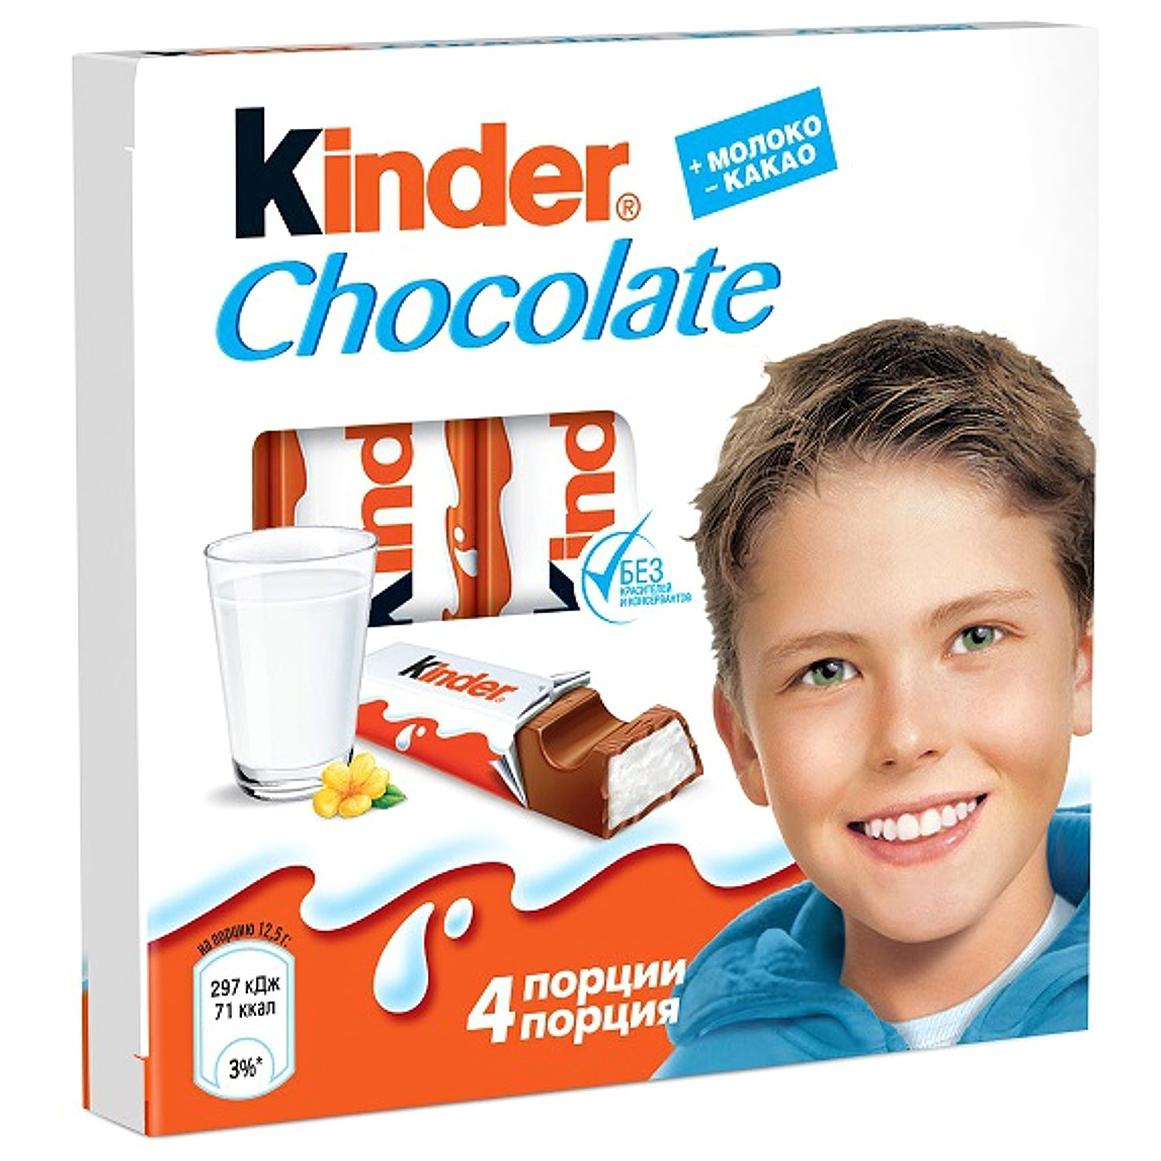 киндер конфета kinder chocolate maxi kinder Шоколад Kinder Chocolate 50 г